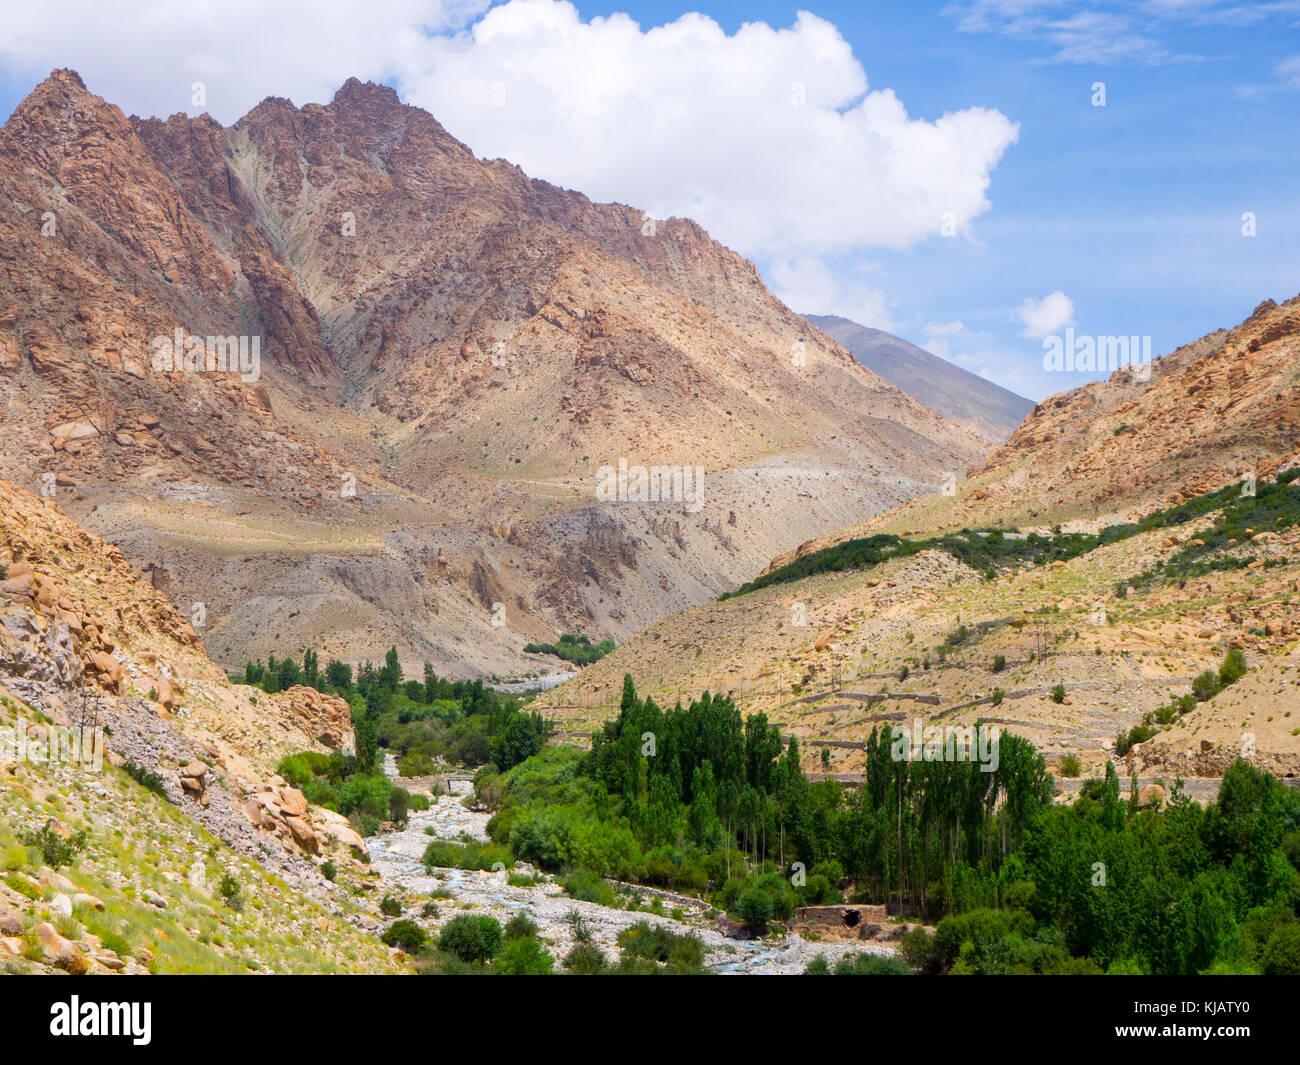 Sham Valley trek landscape - Ladakh India - Stock Image